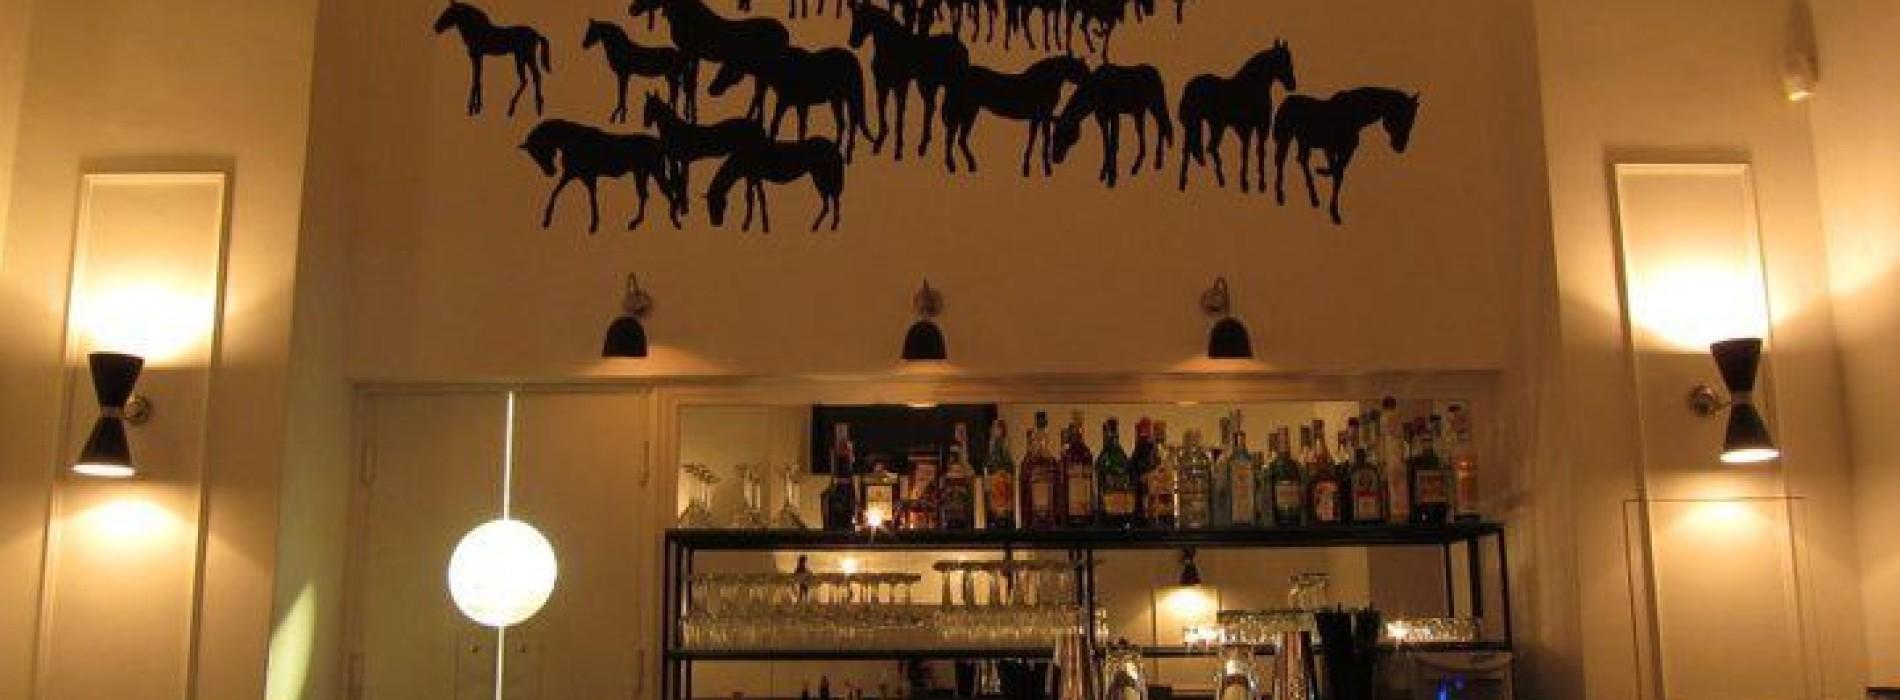 I 23 cavallini, New York a Prati